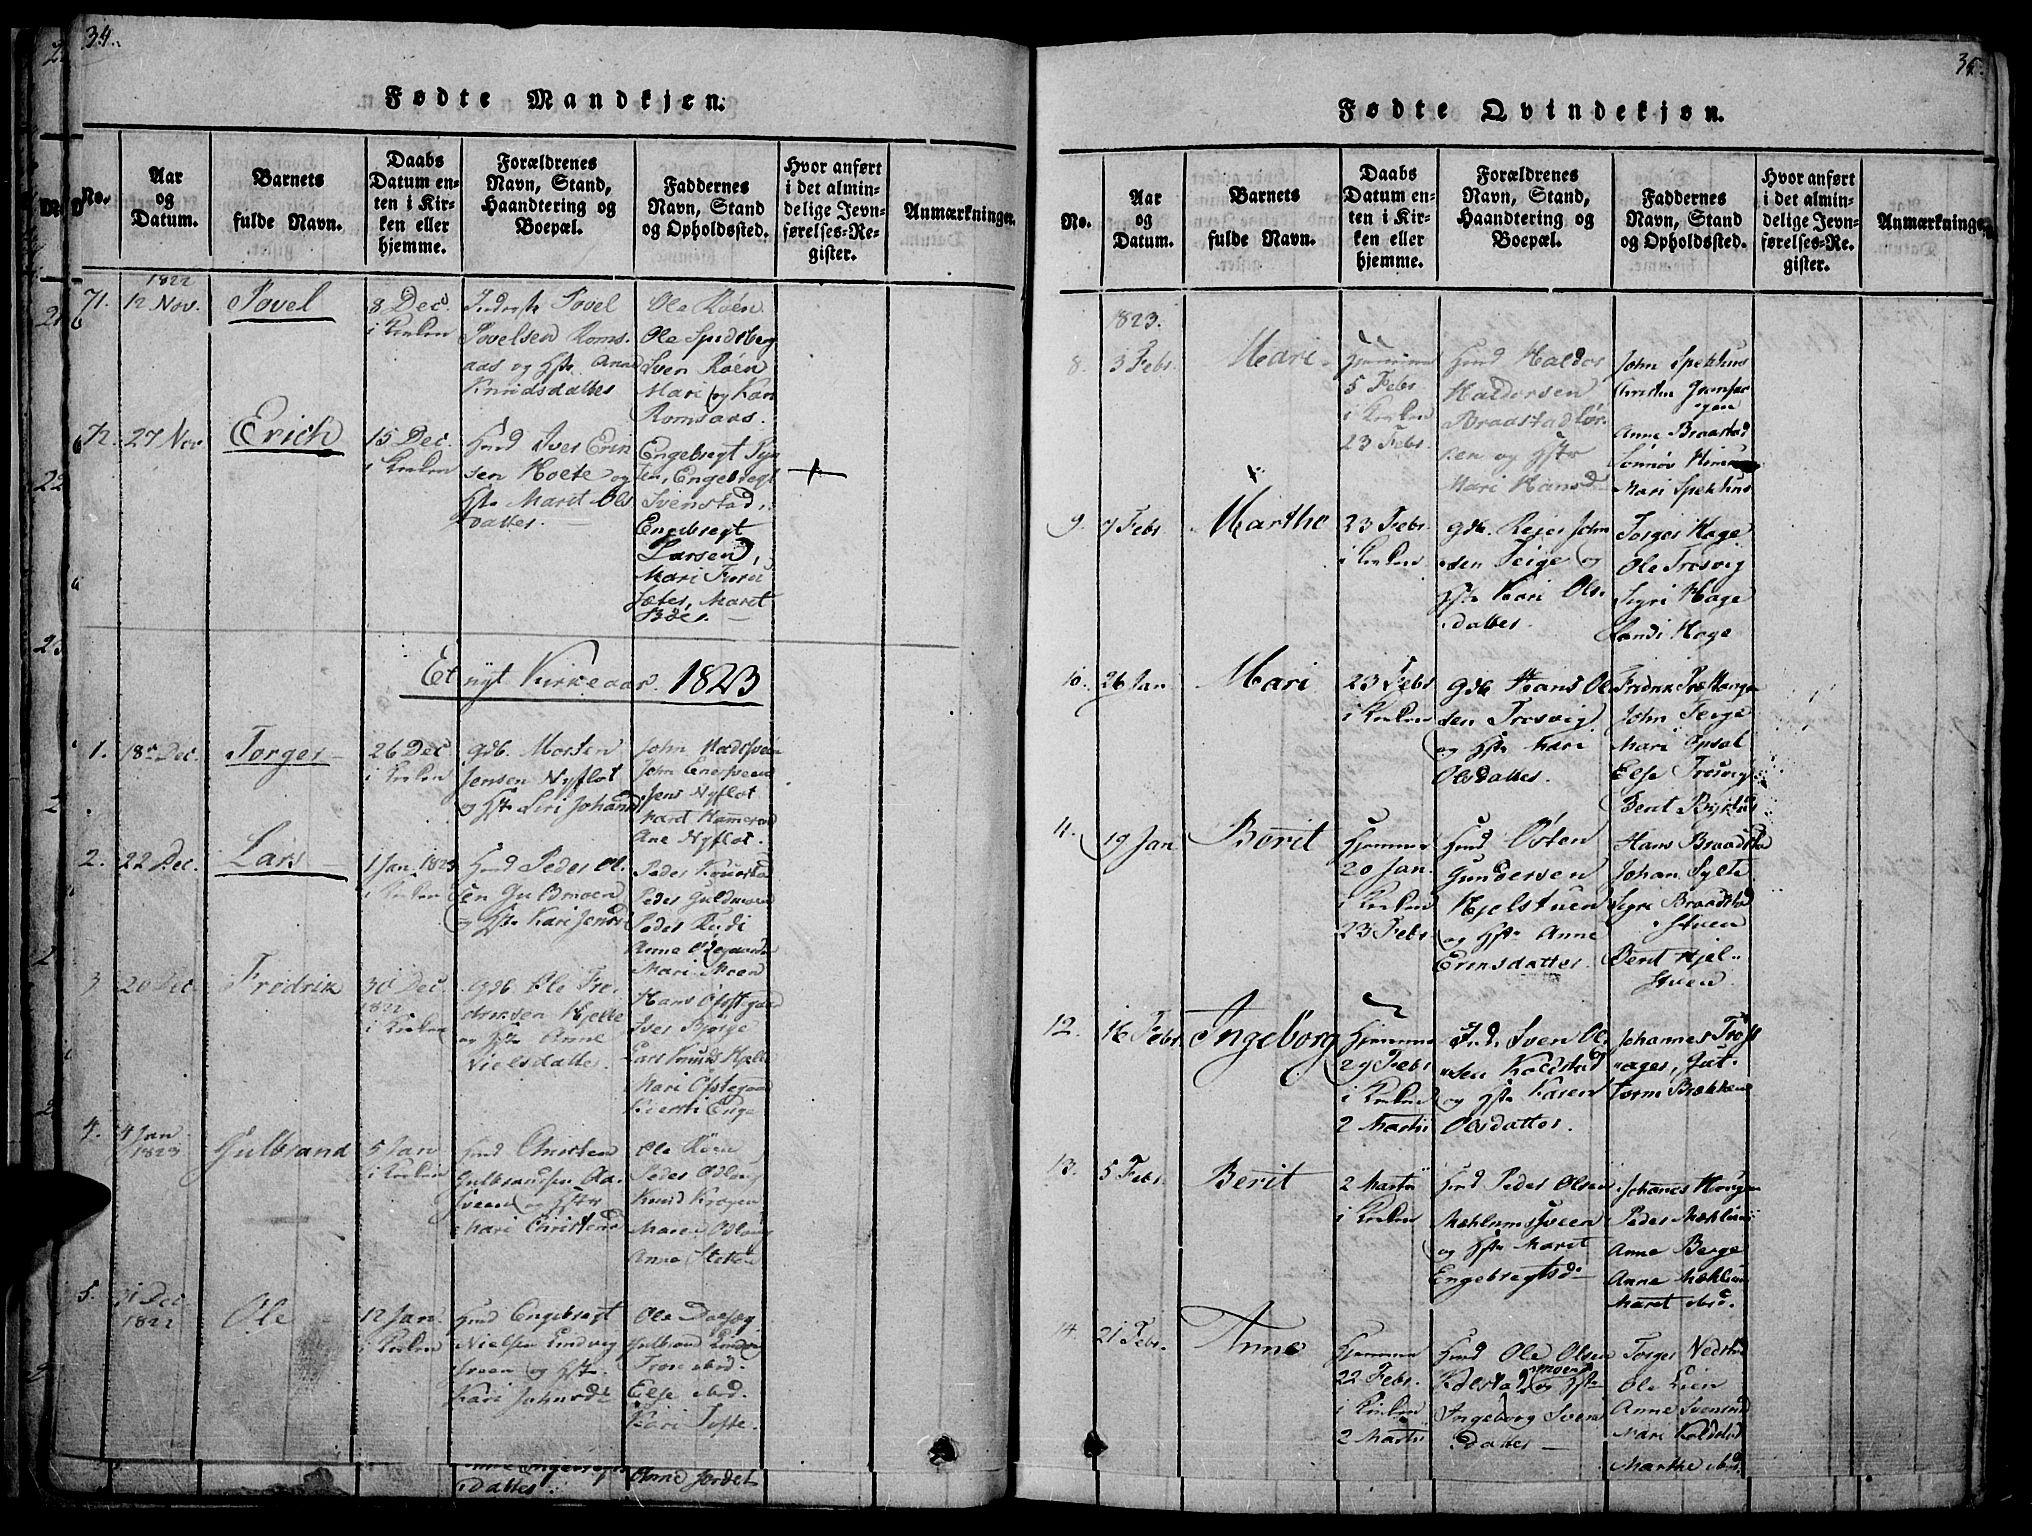 SAH, Ringebu prestekontor, Ministerialbok nr. 4, 1821-1839, s. 34-35